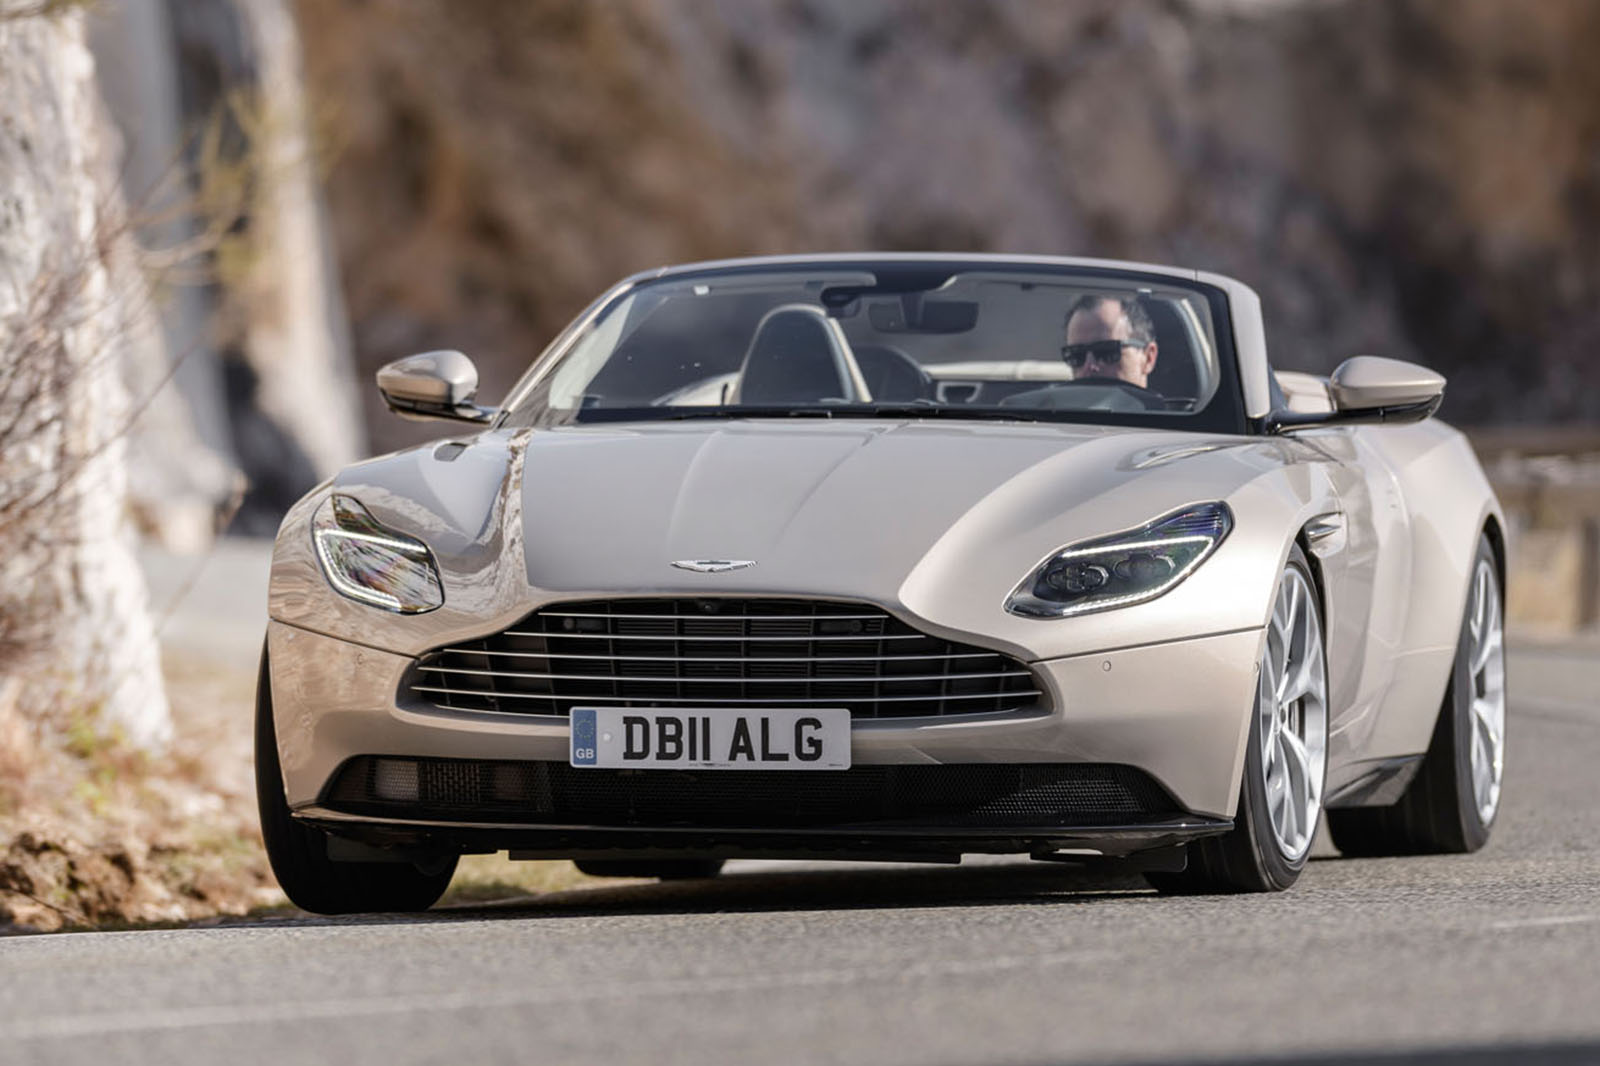 Aston Martin Db11 Volante 2018 Review Autocar